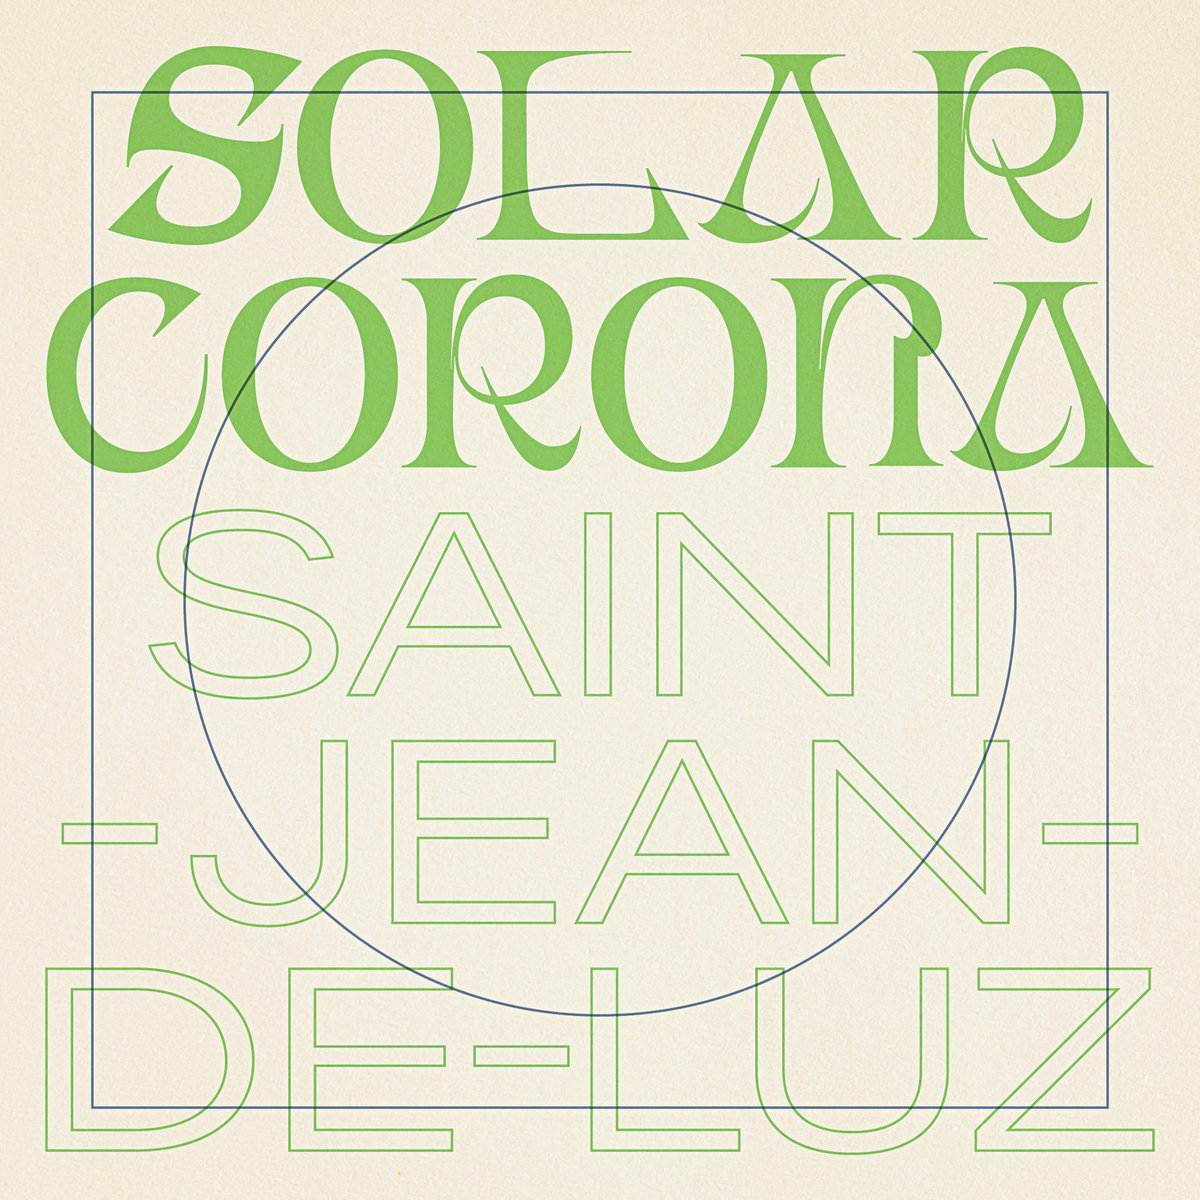 solar corona saint jean de luz